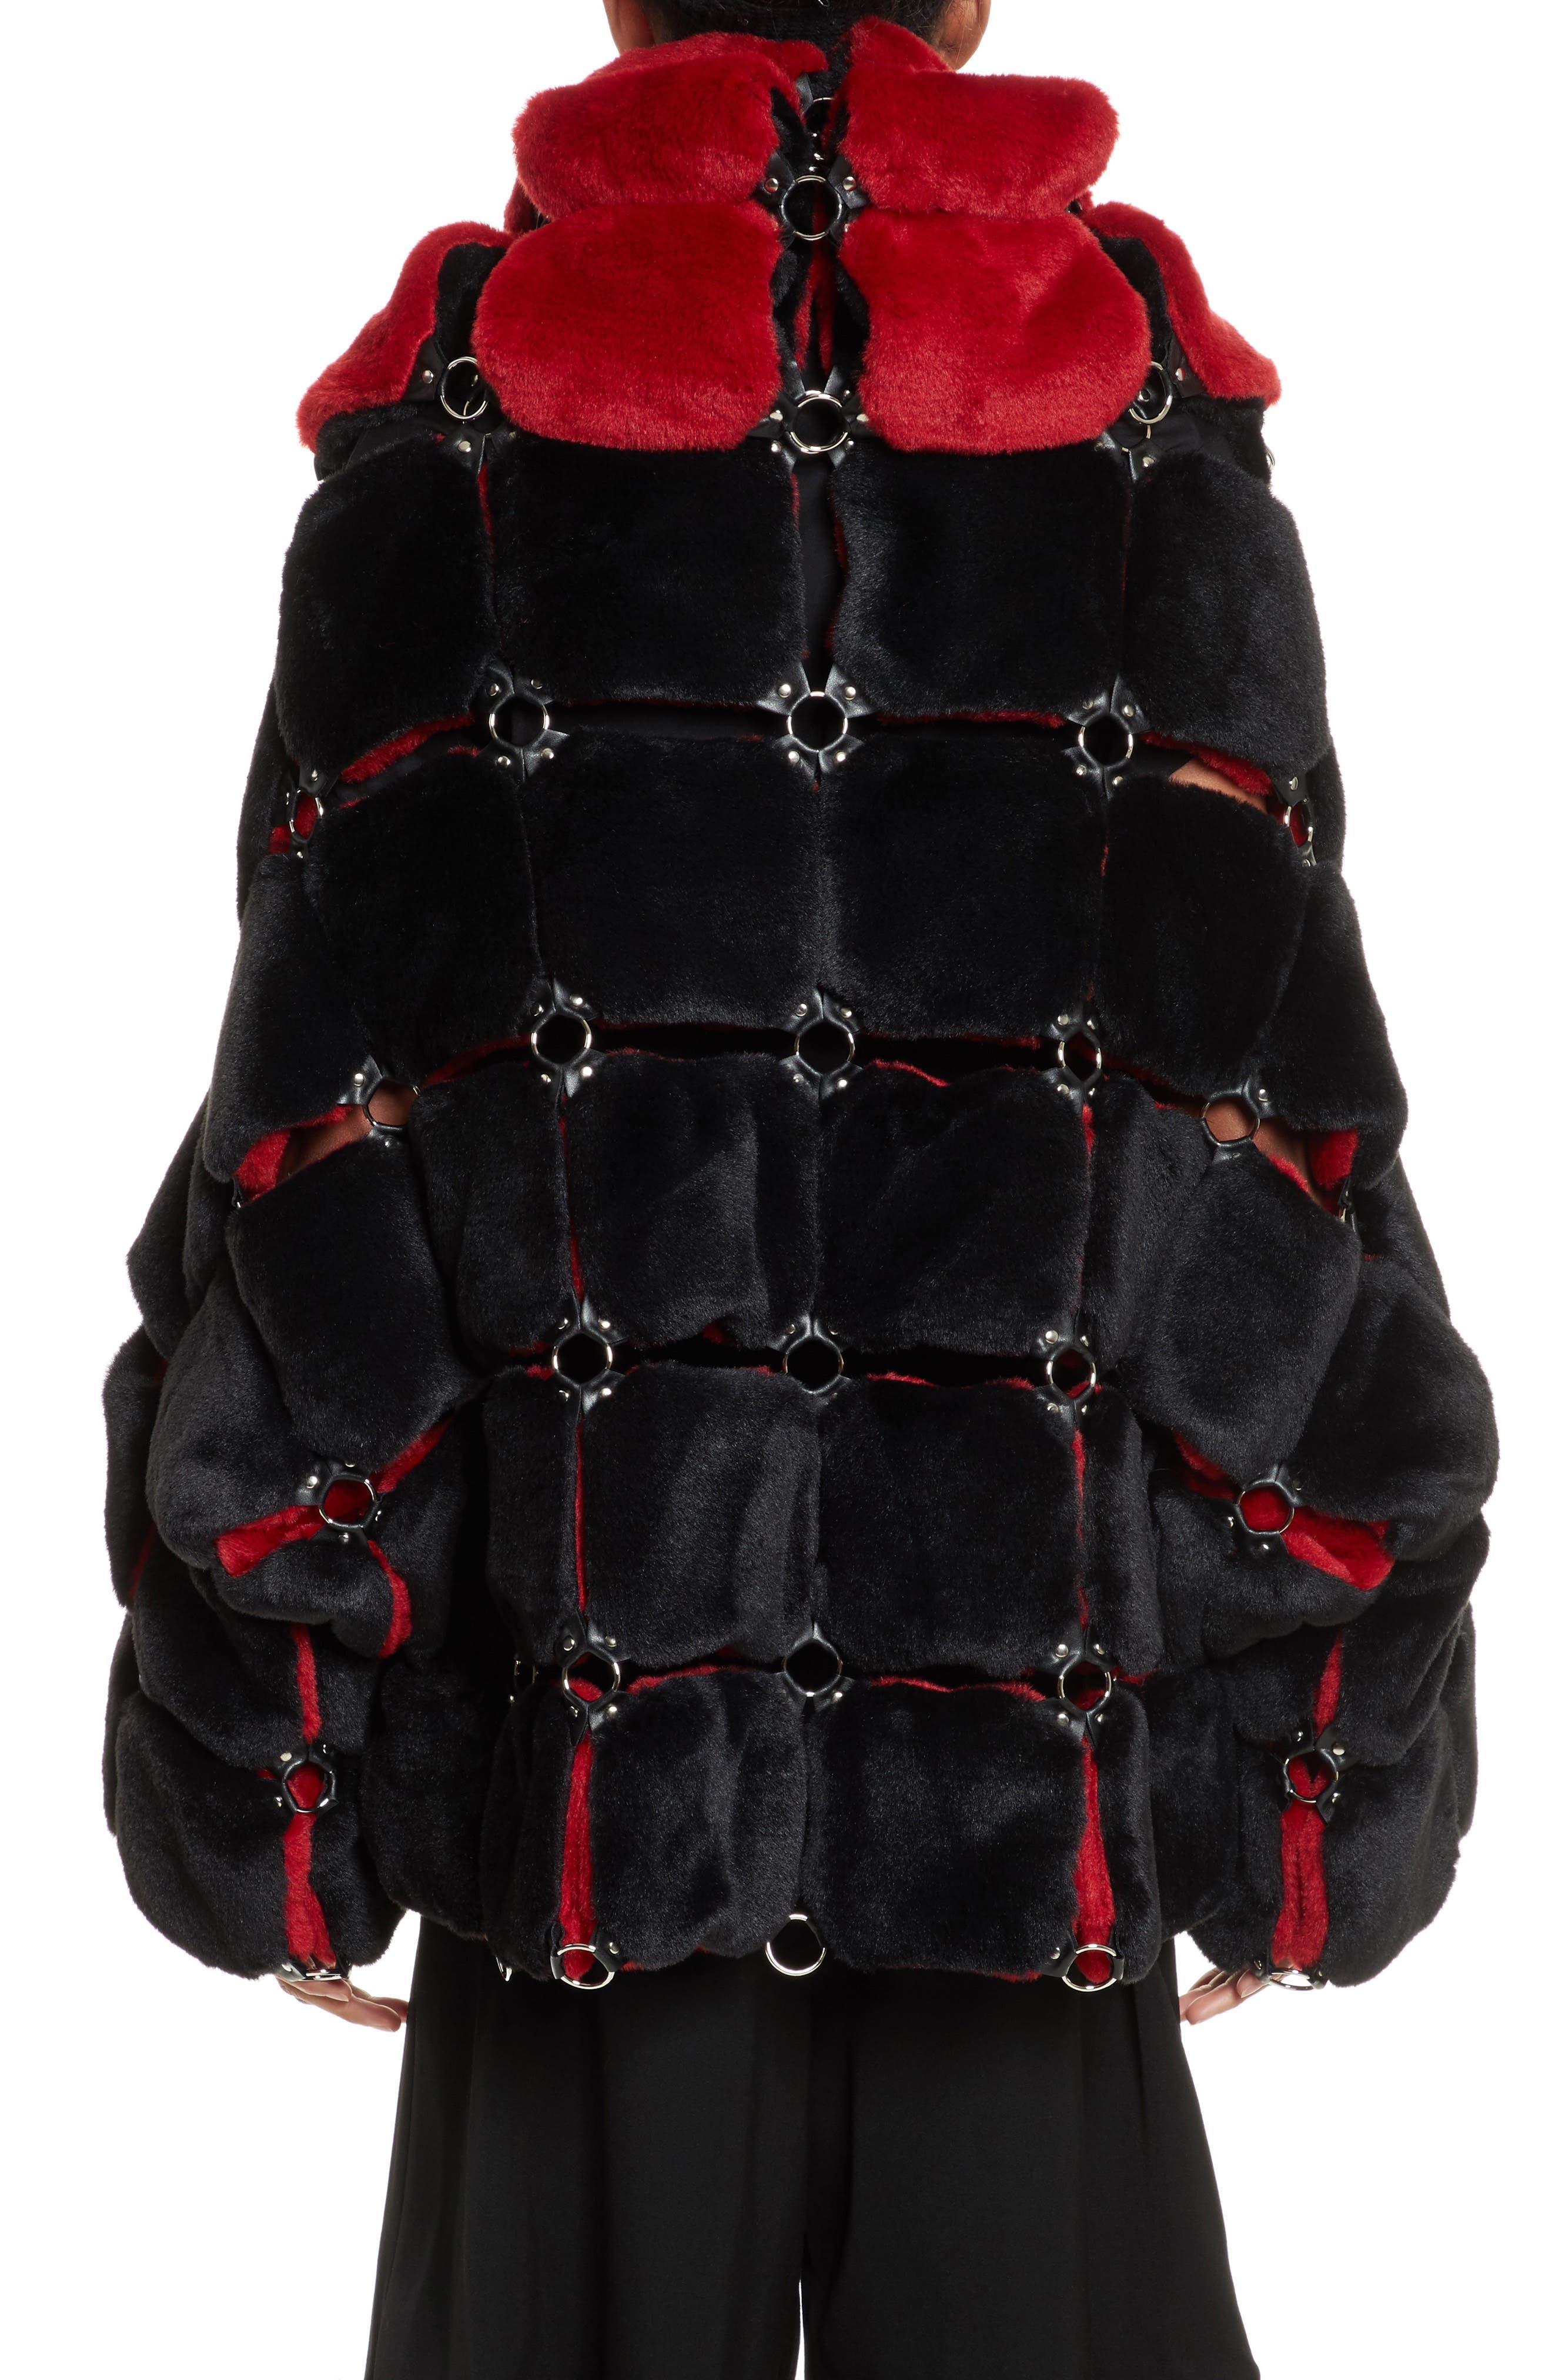 Faux Fur Coat with Chain Mail Detail,                             Alternate thumbnail 2, color,                             005